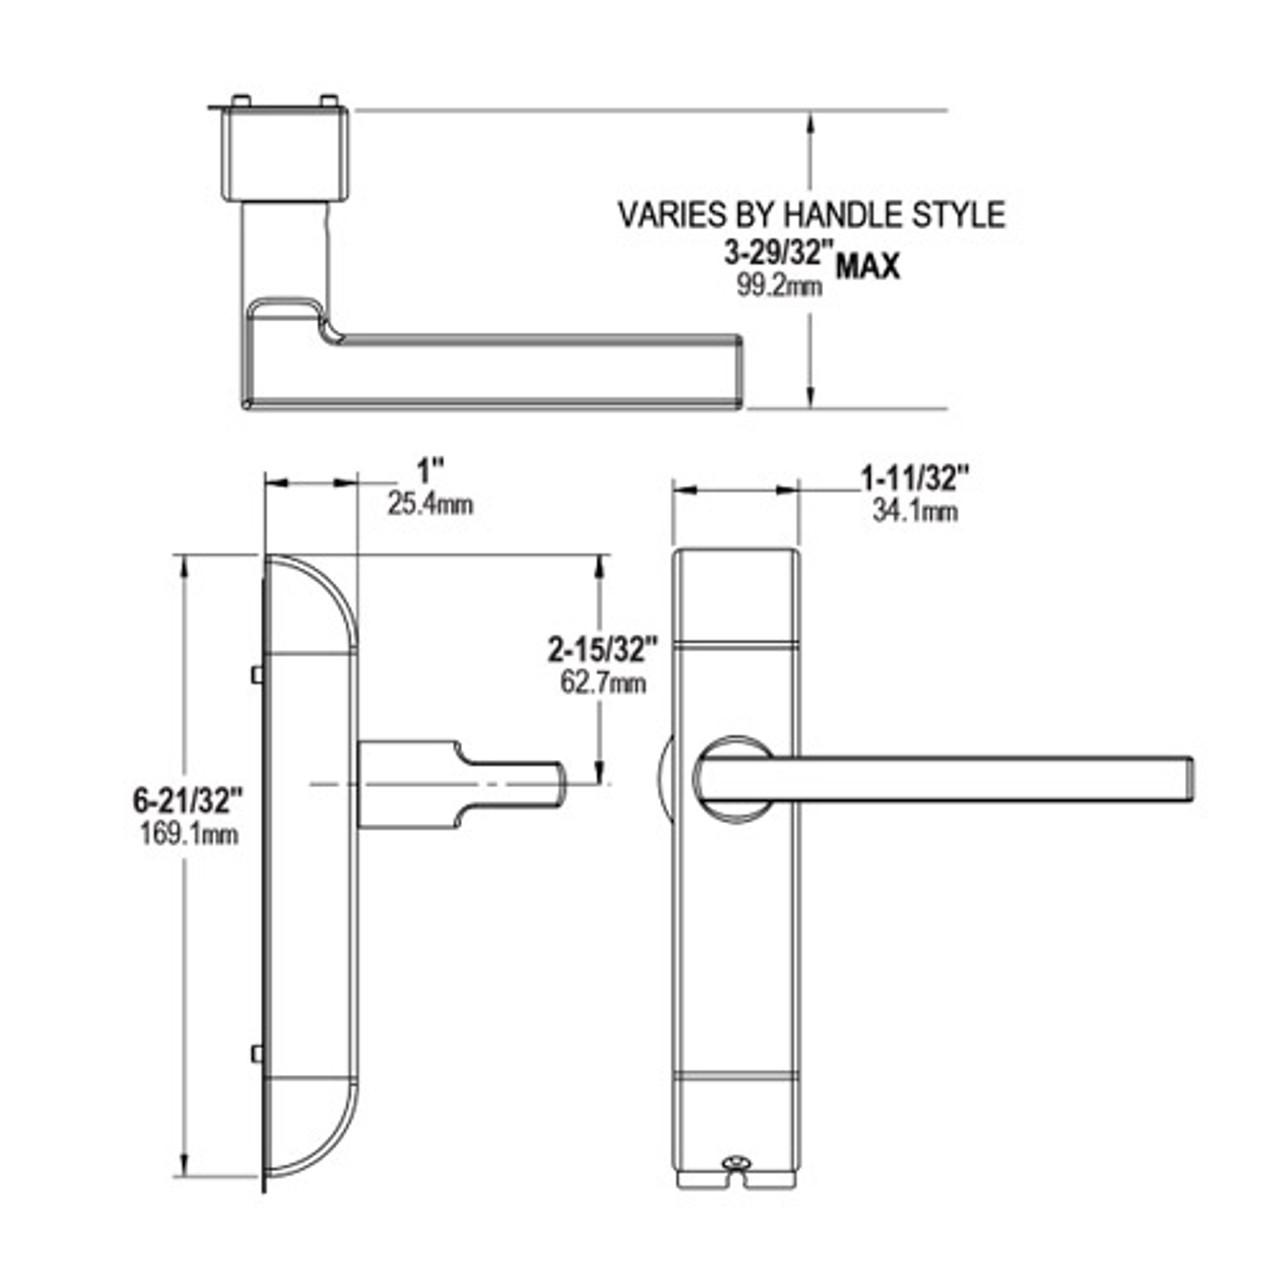 4600M-MD-631-US4 Adams Rite MD Designer handle Dimensional View